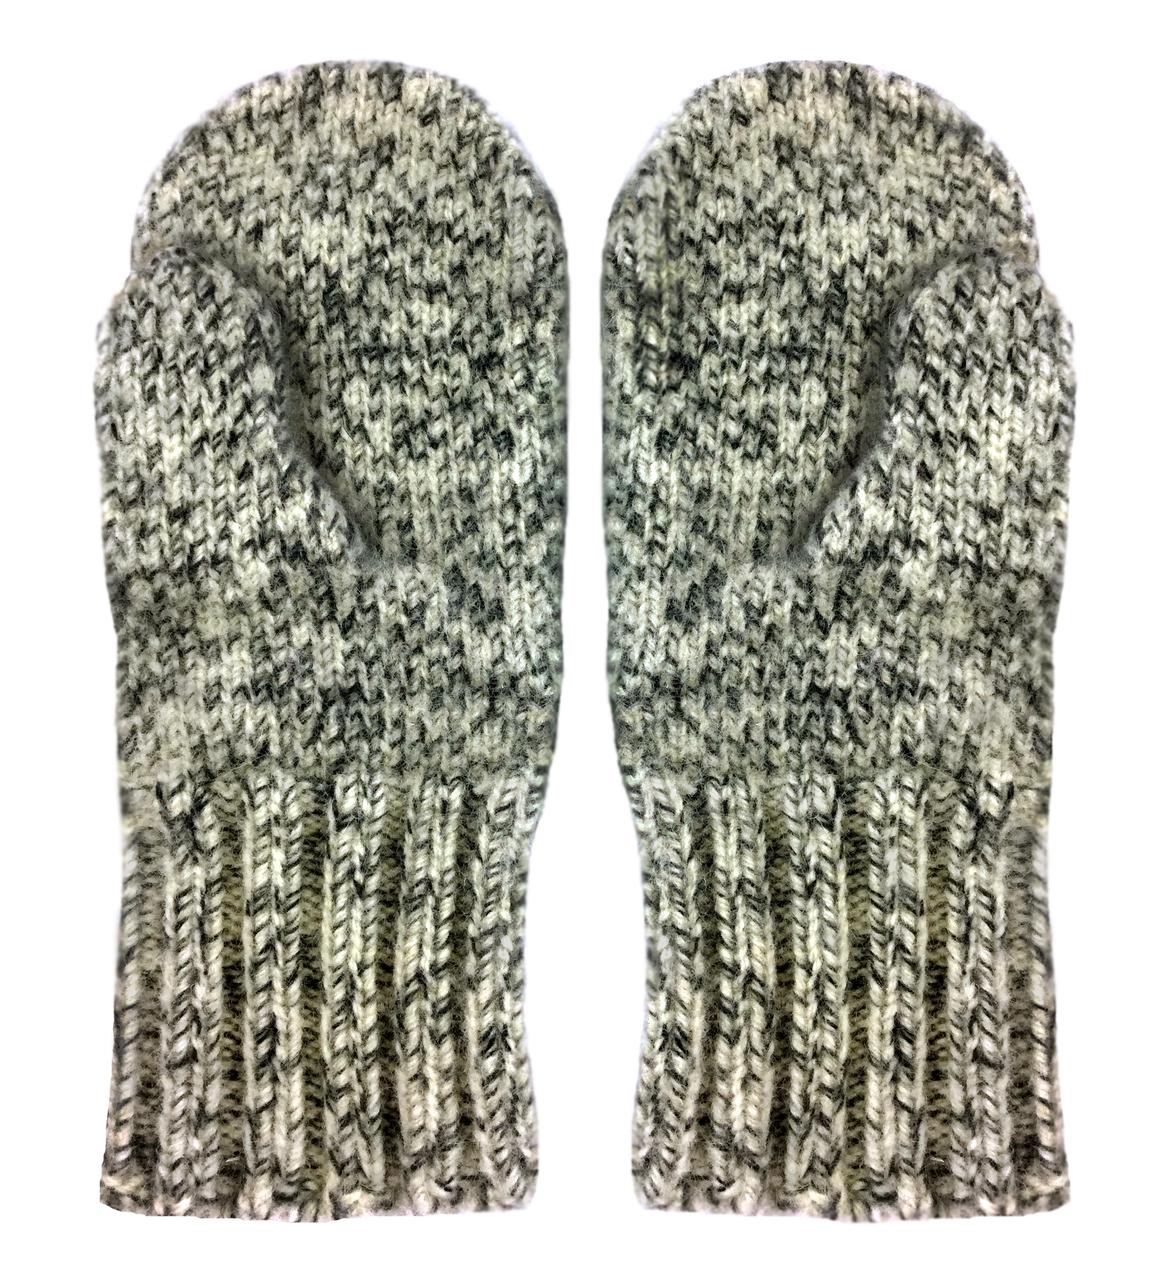 6e24b479355 Dachstein Woolwear Boiled Wool Mittens - Sweater Chalet